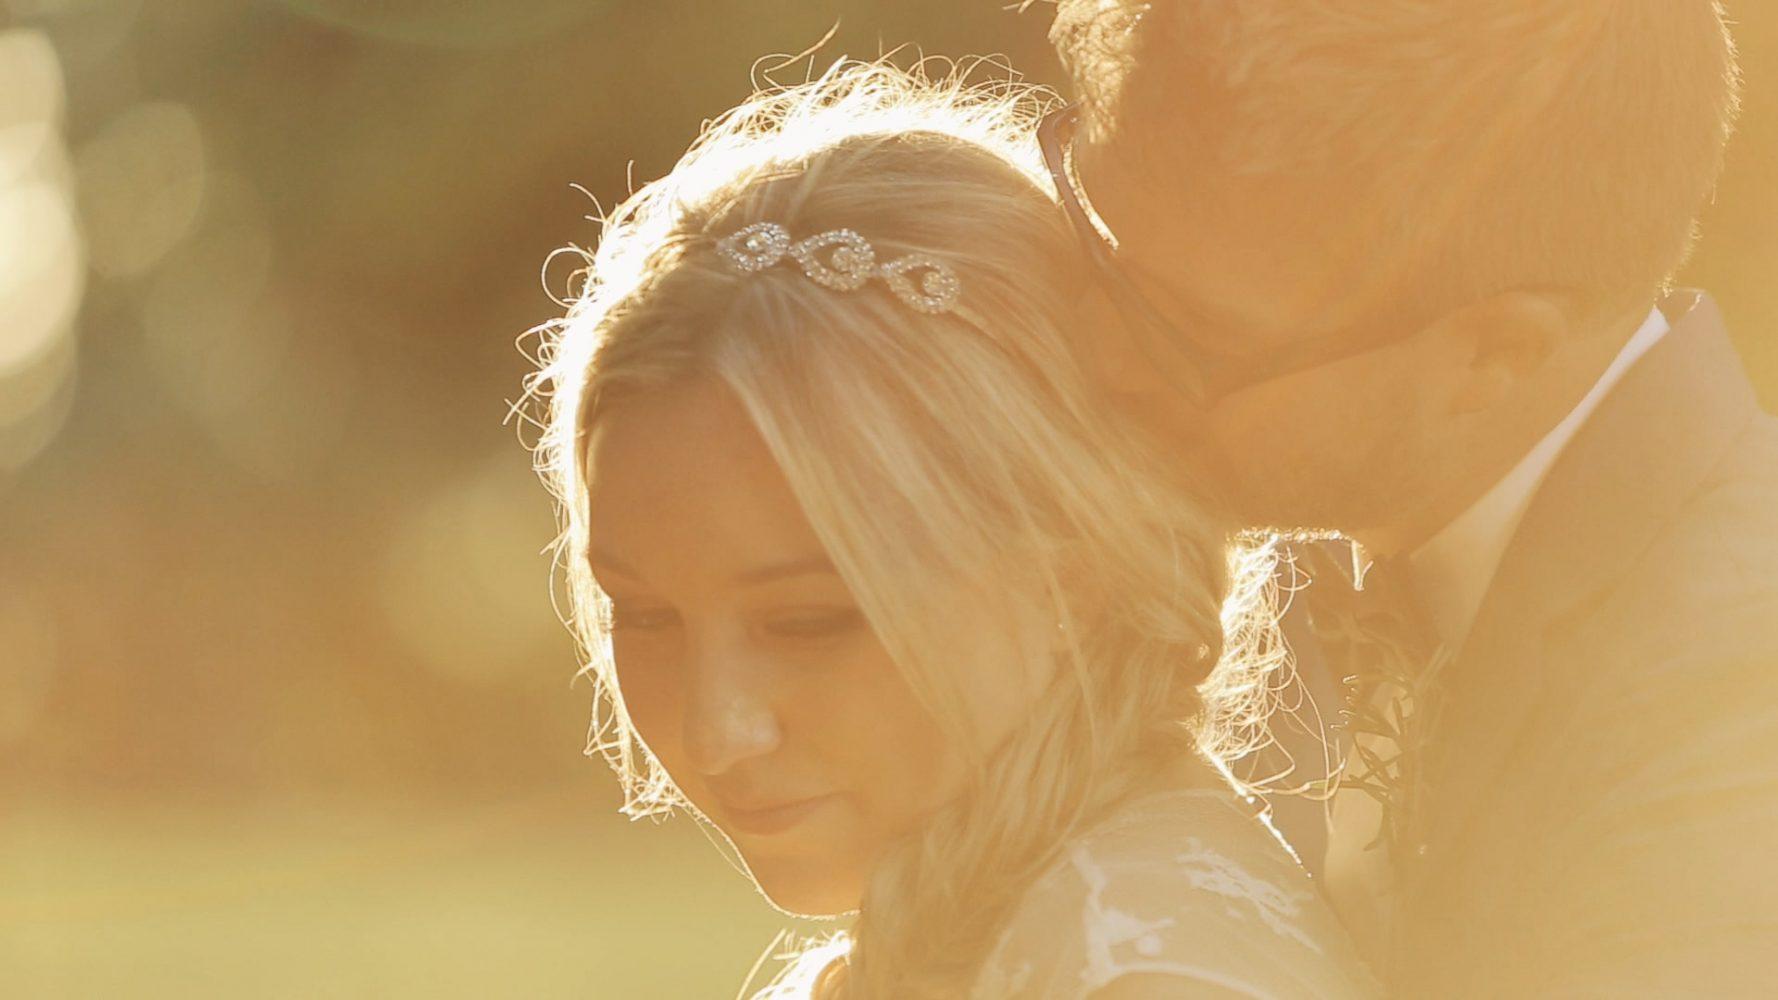 Fairground Rides Themed Aynhoe Park Wedding